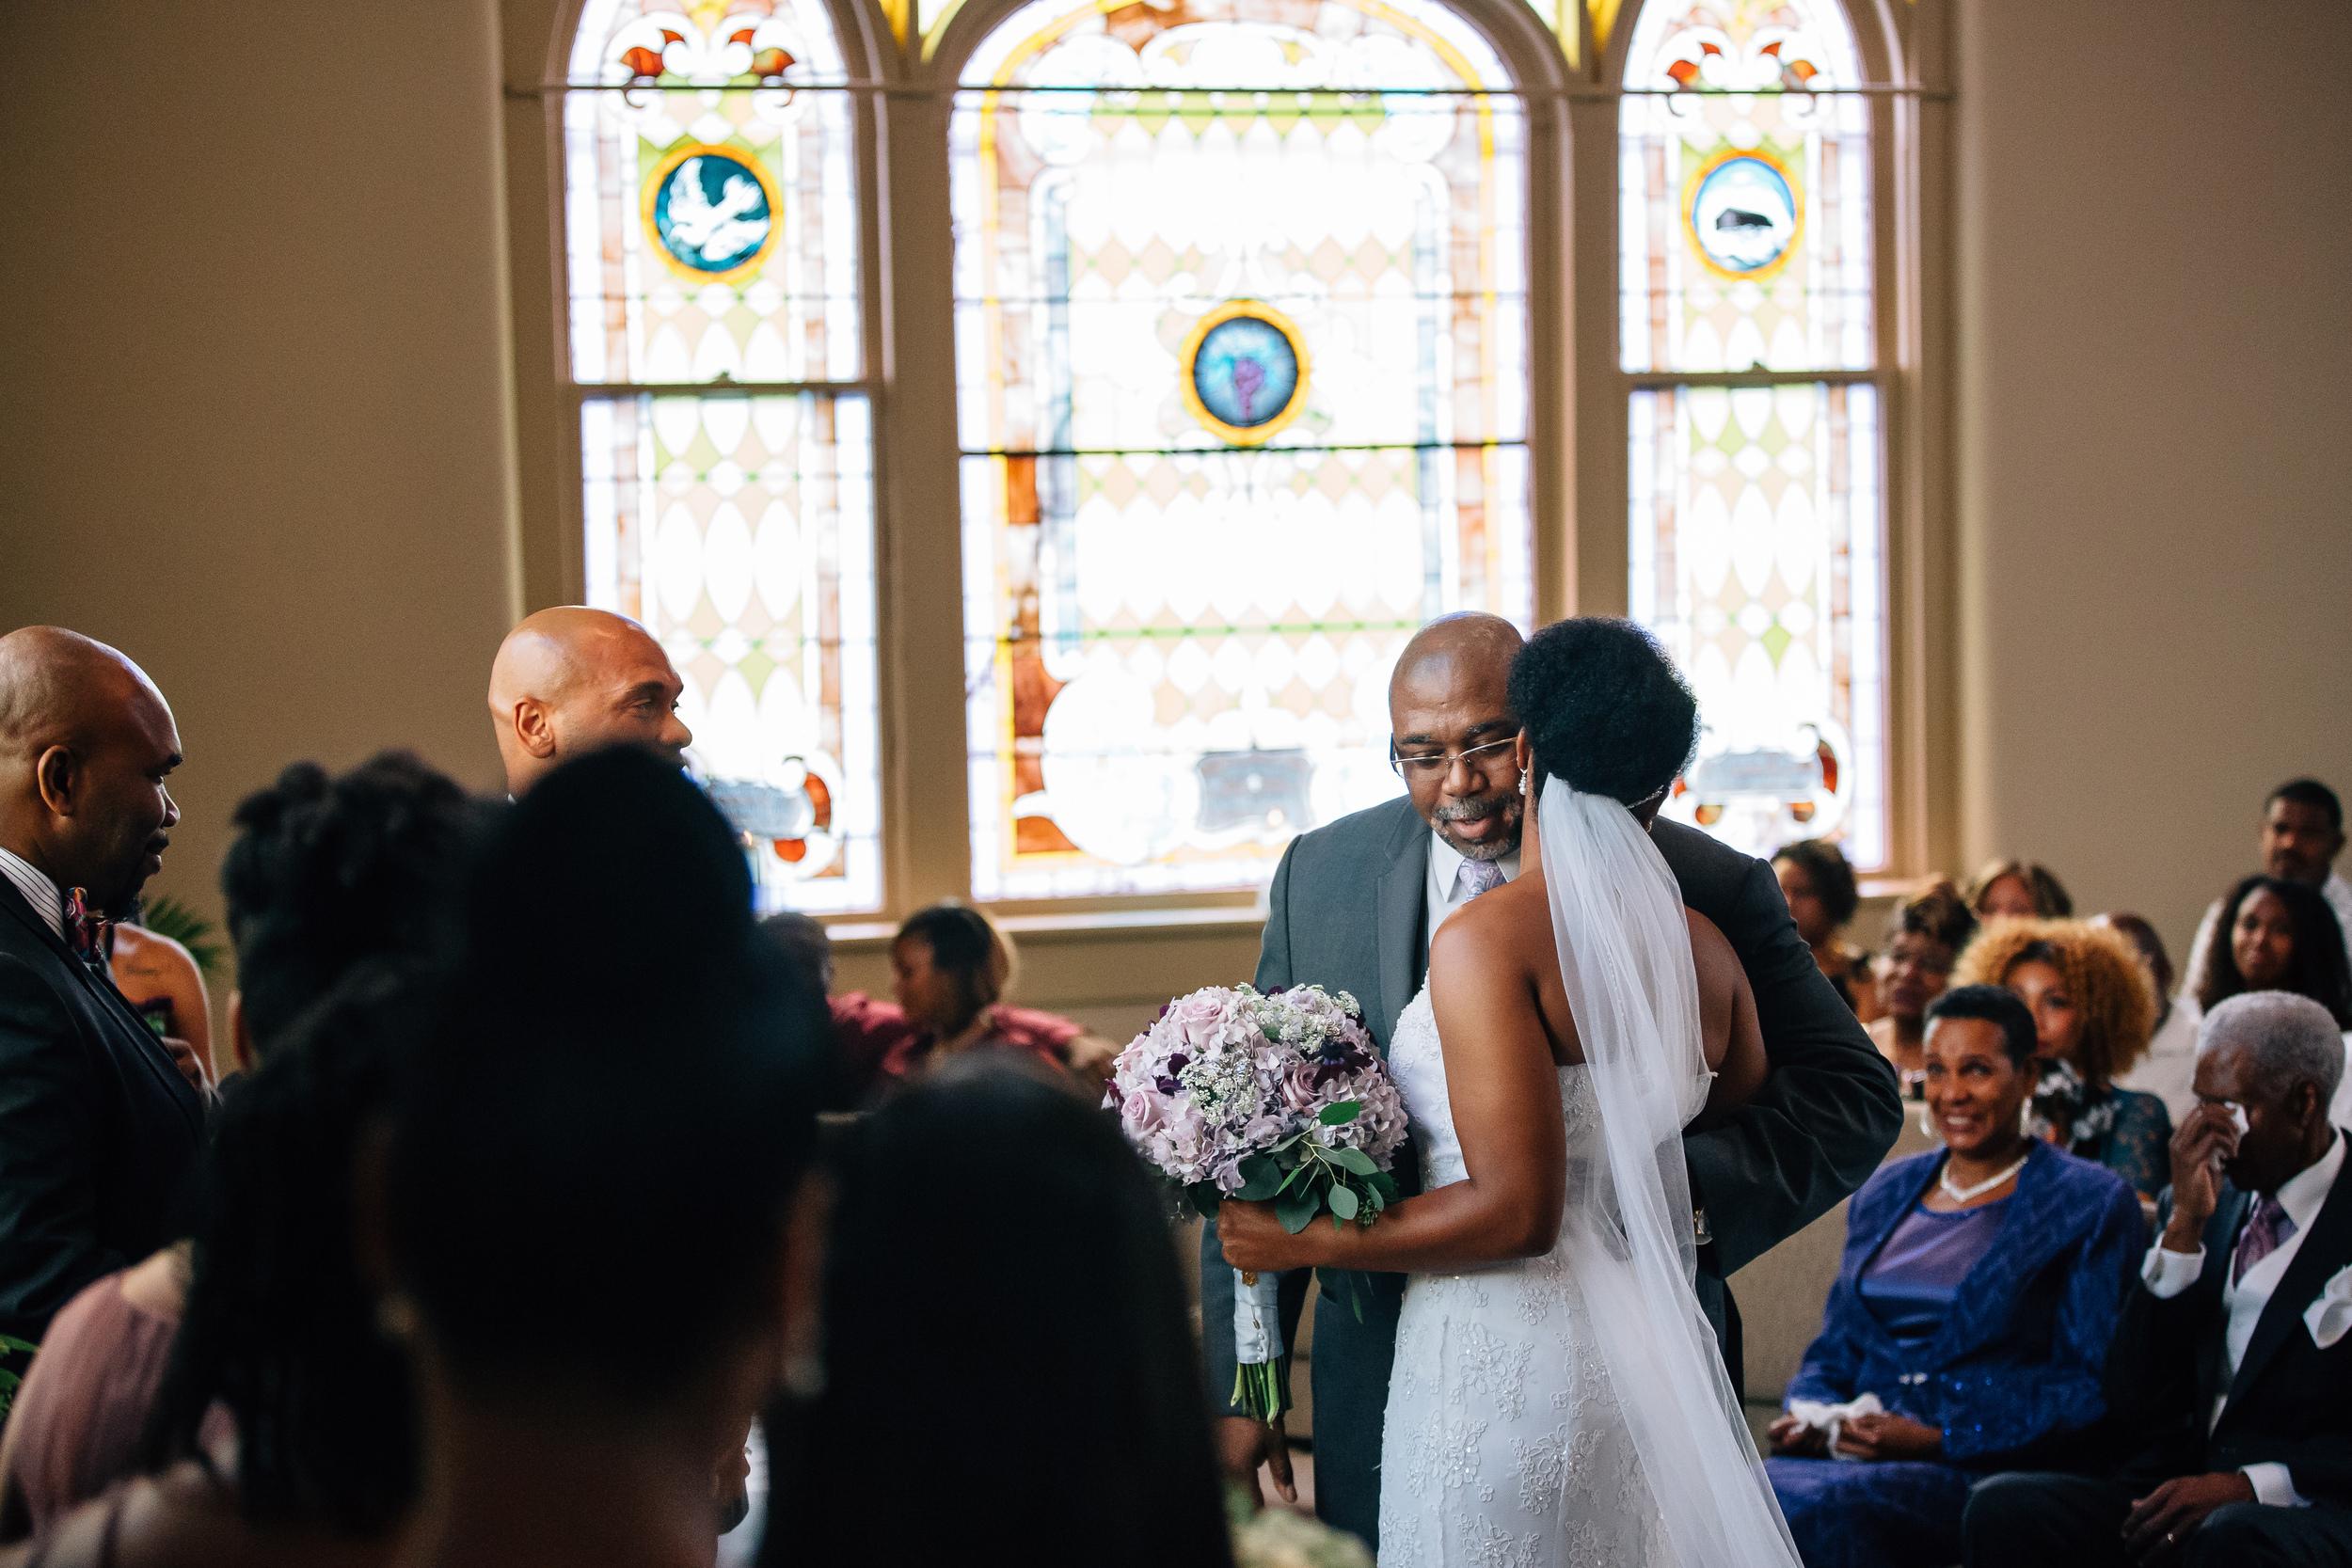 Chuck & Alicia's Wedding - Corrie Mick Photography-246.jpg